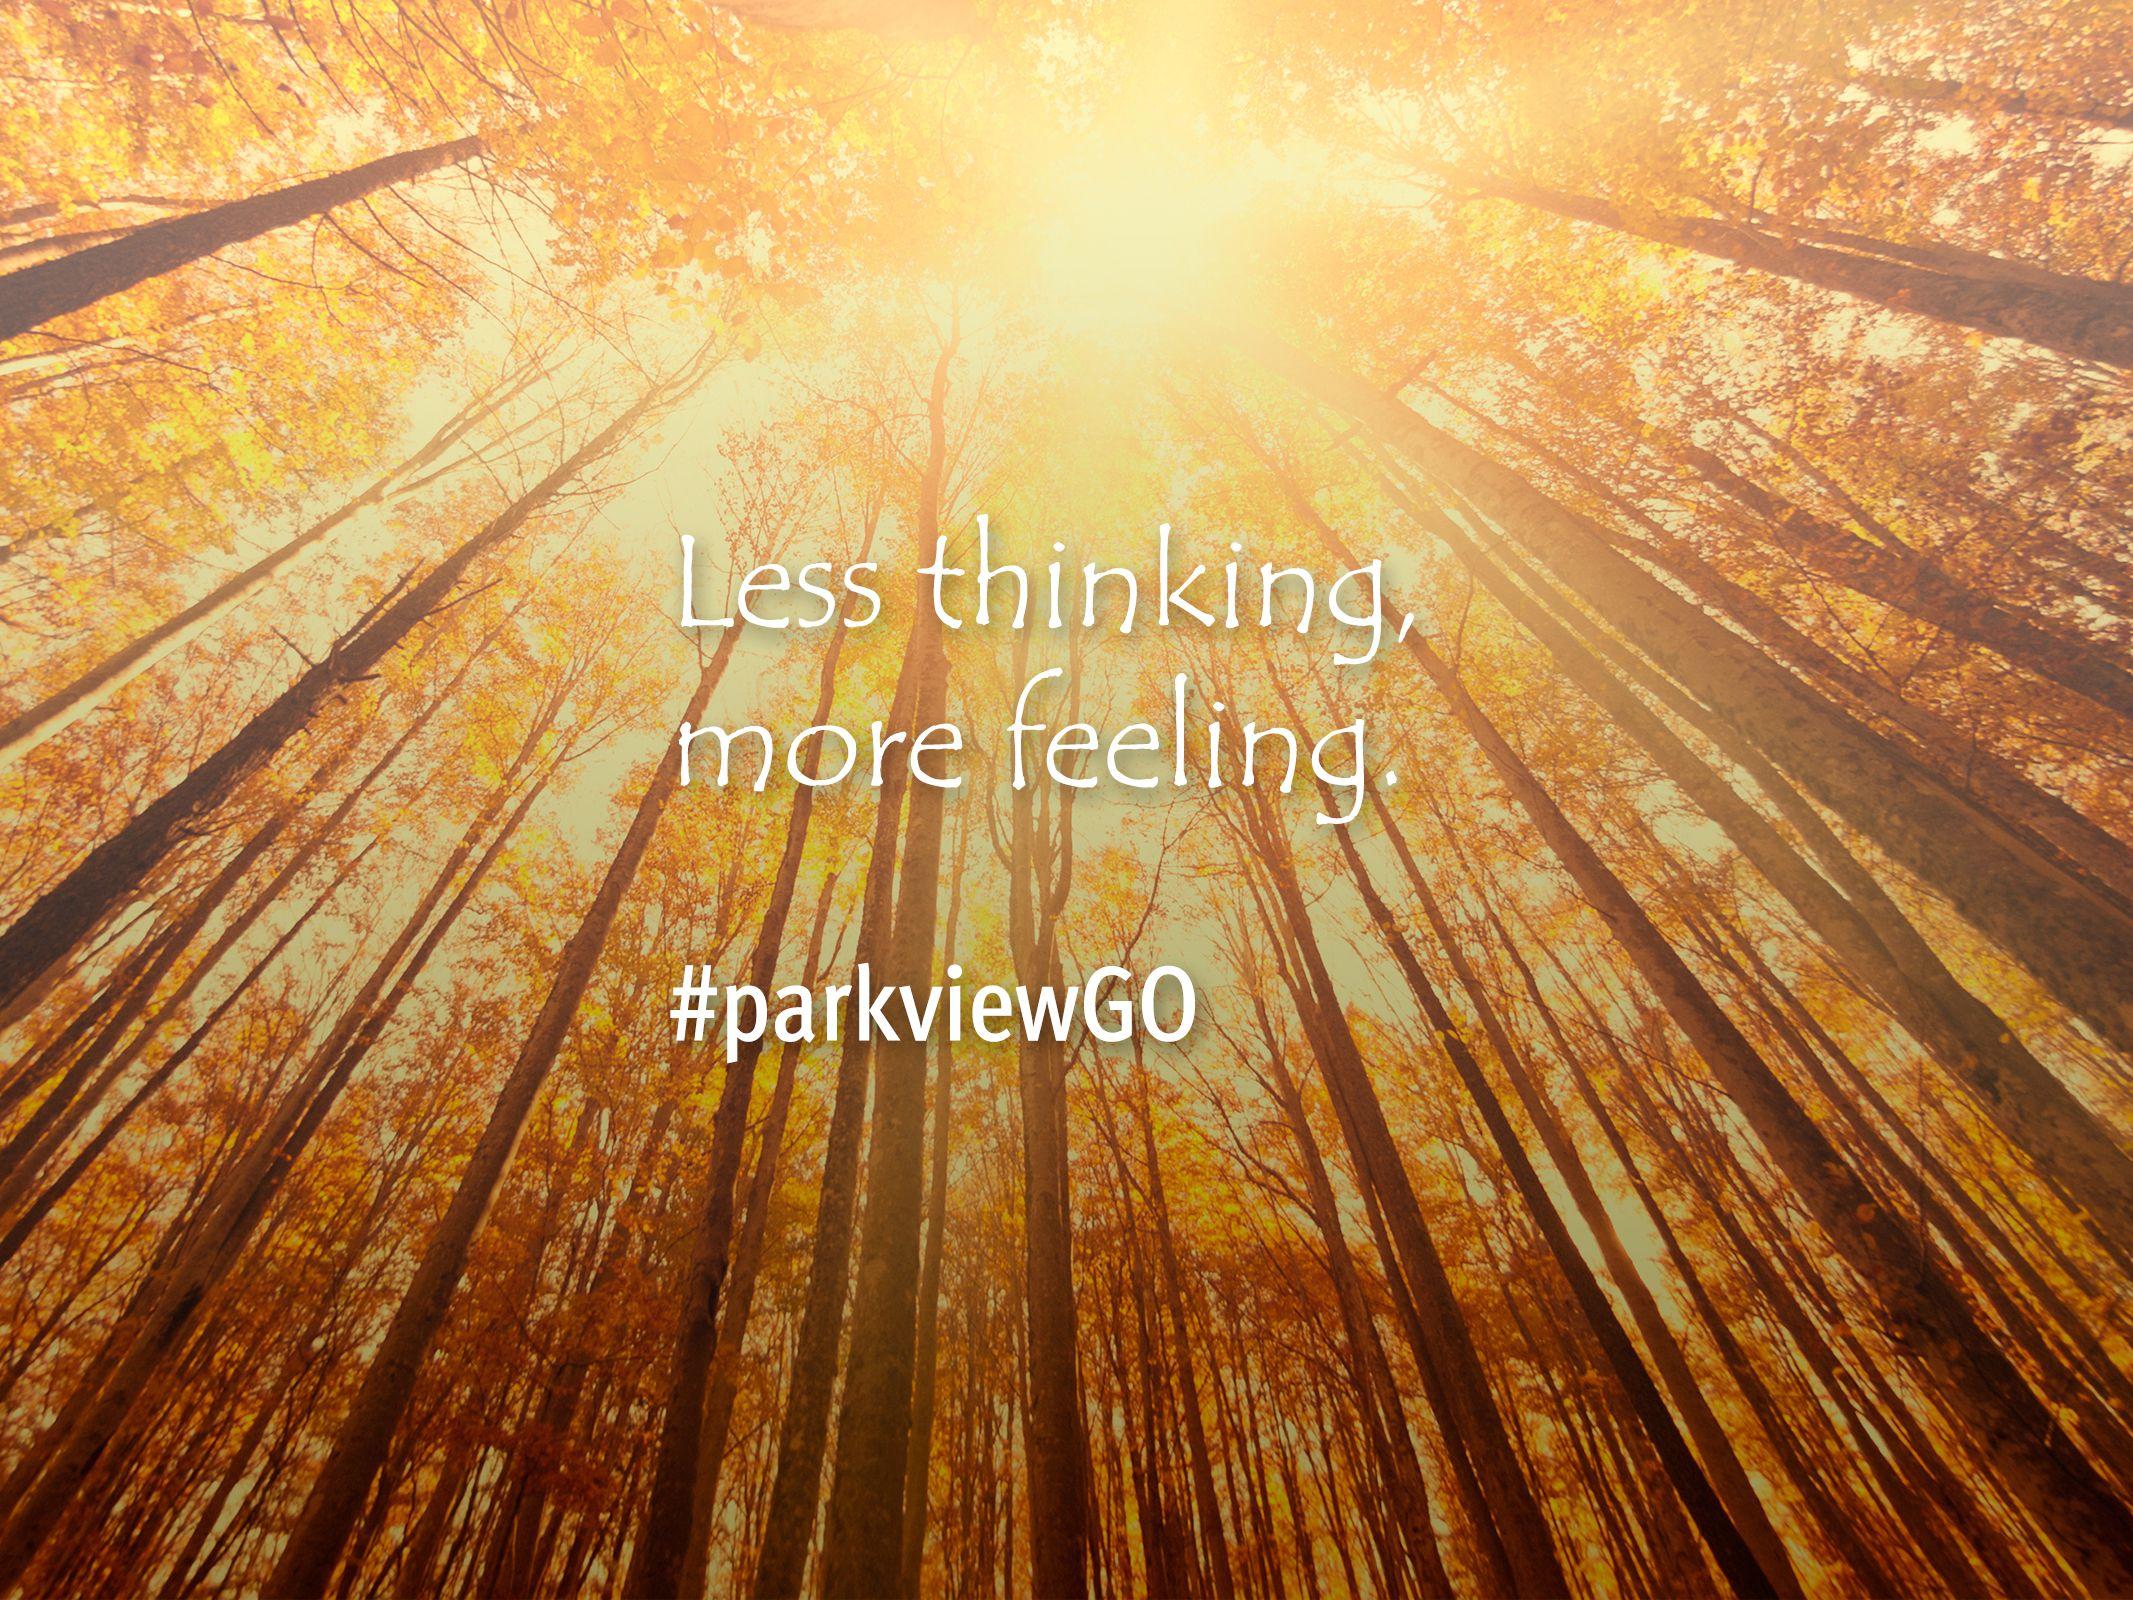 Desktop Wallpaper Download #quote #mindfulness #meditation | via @ParkviewHealth